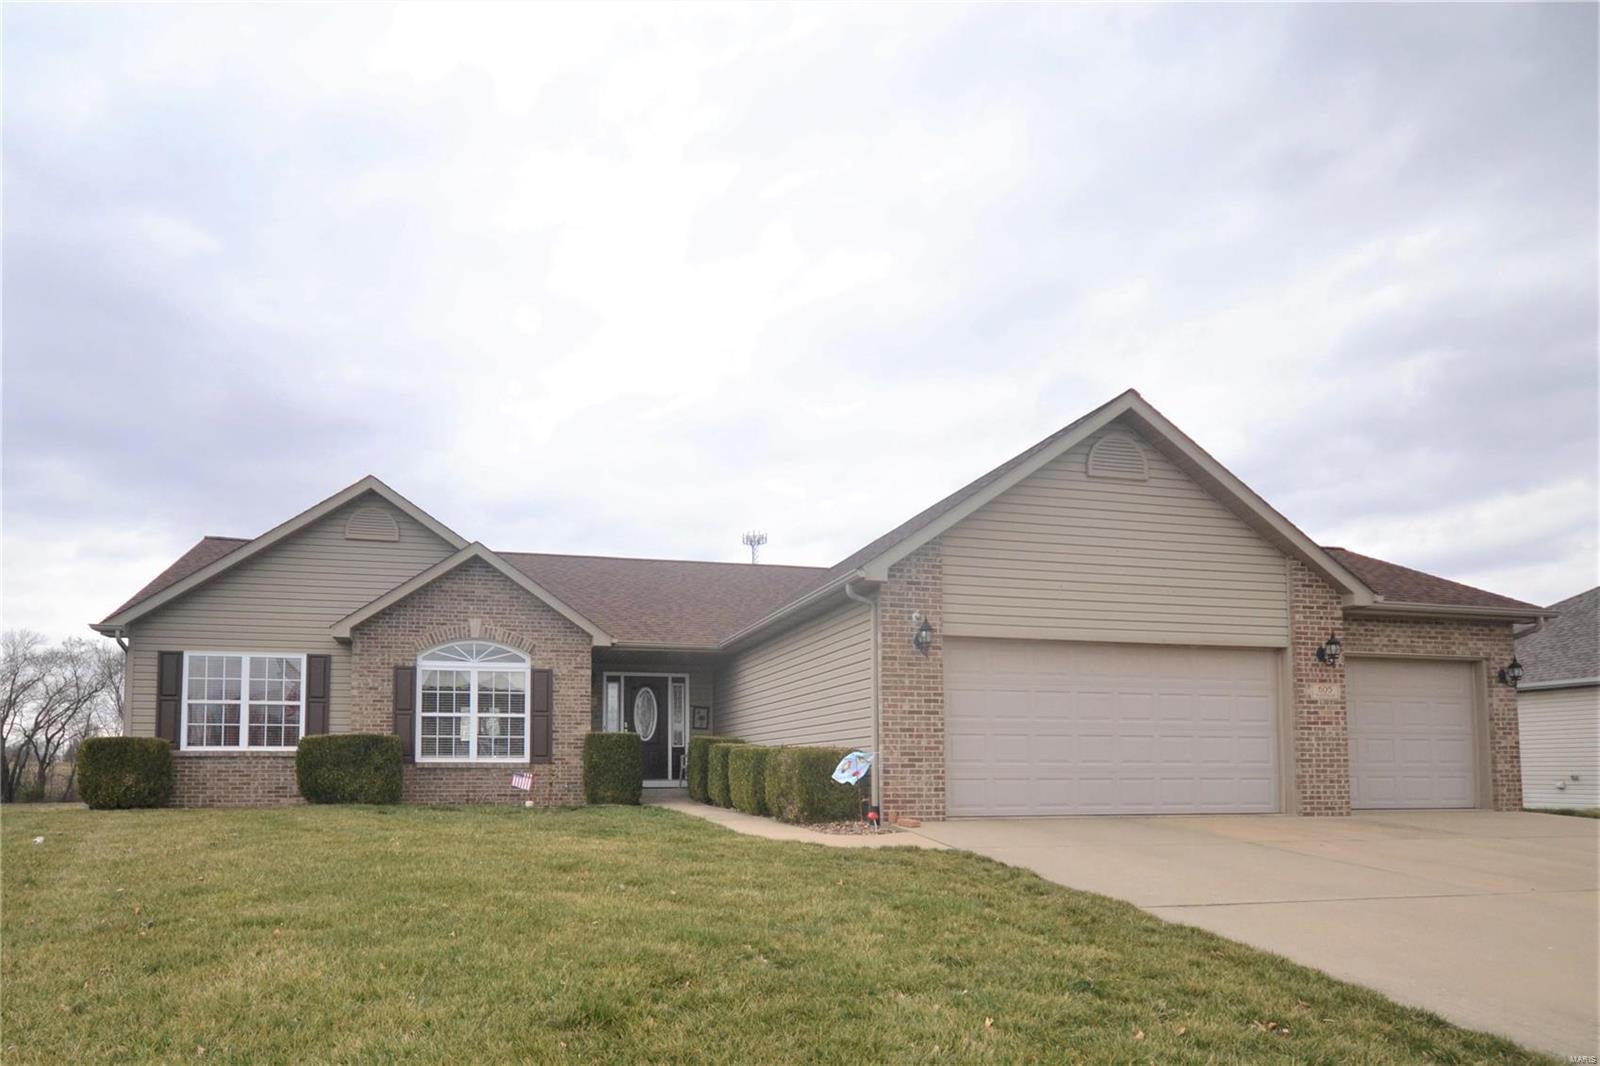 605 Fieldview Drive Property Photo - Smithton, IL real estate listing